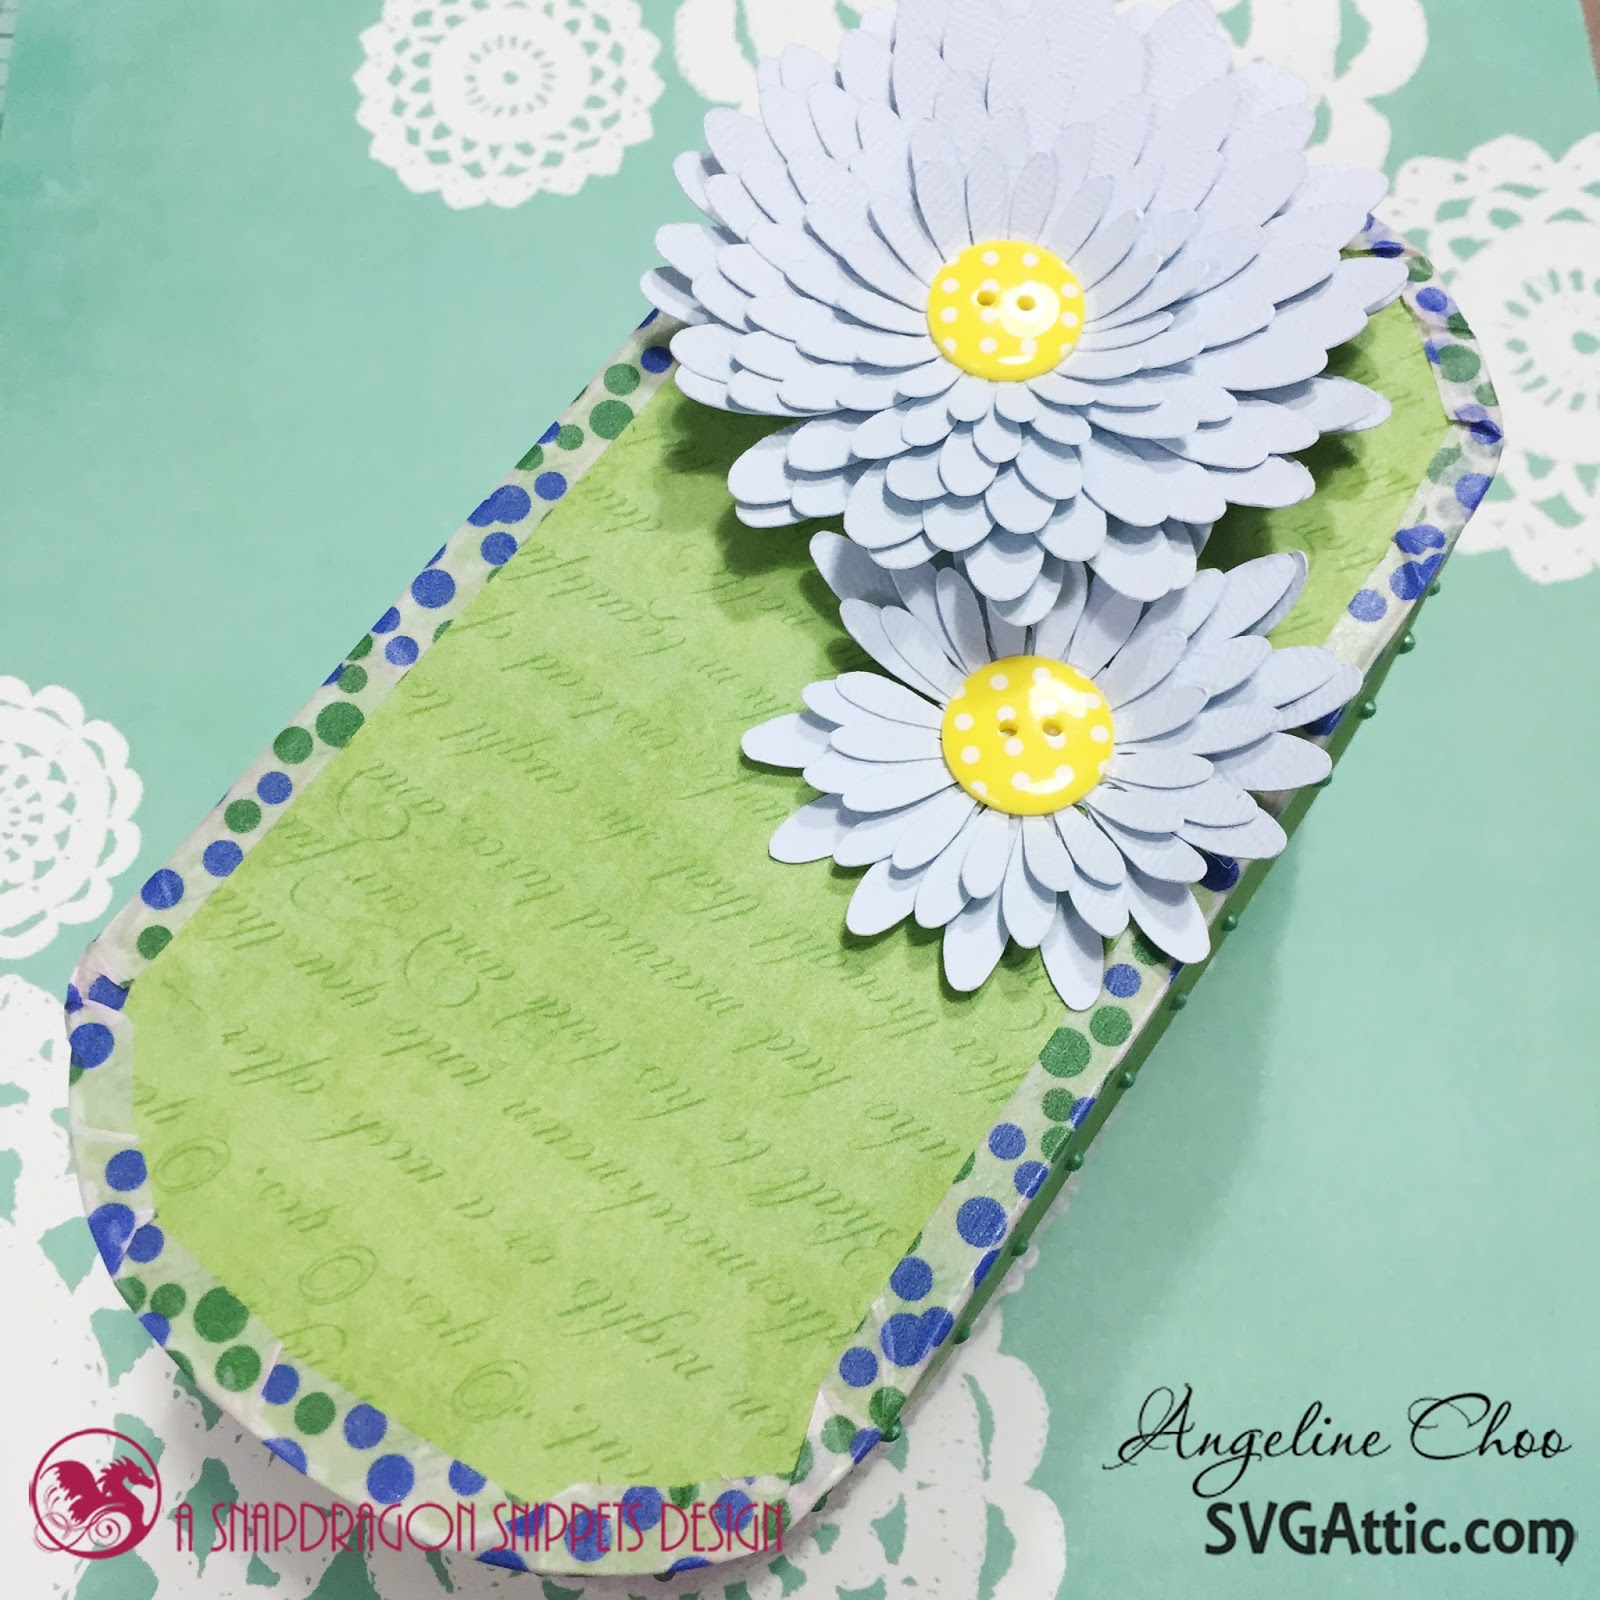 SVG Attic: Flower box with Angeline Choo #svgattic #scrappyscrappy #giftbox #flowers